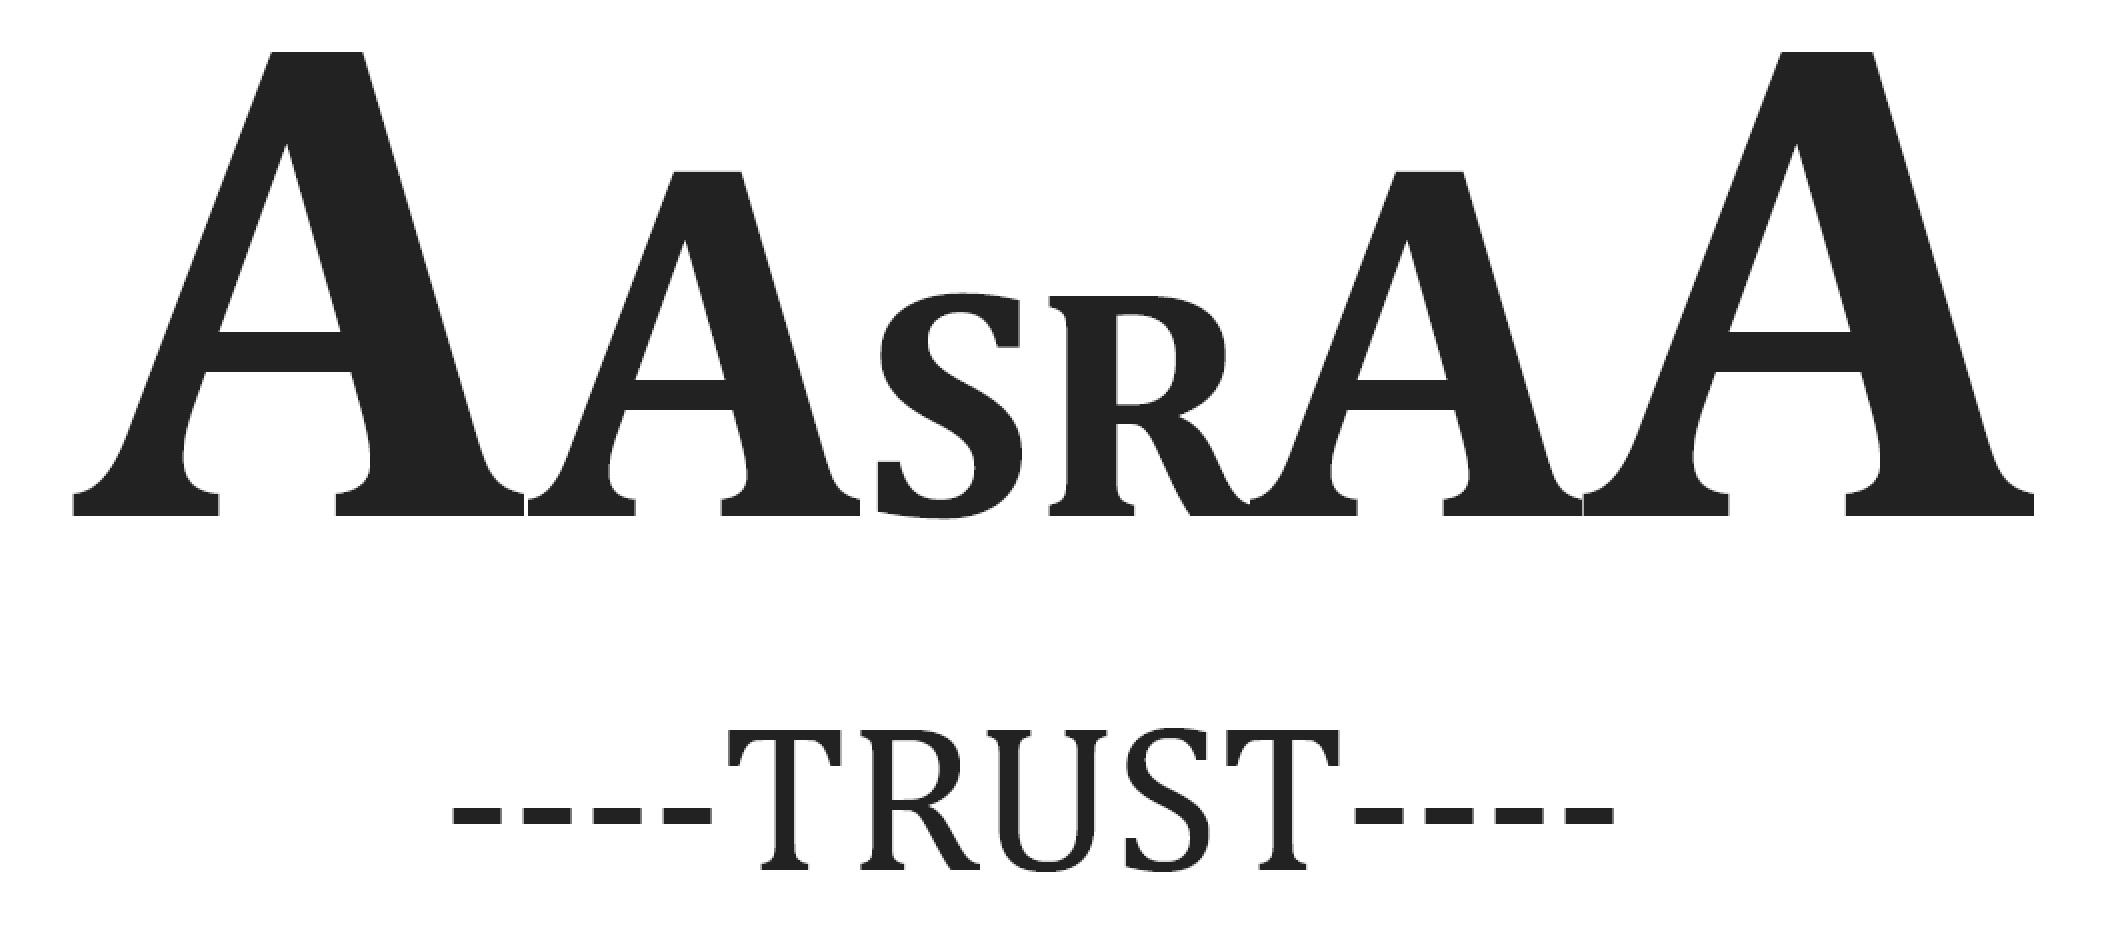 Aasraa Trust